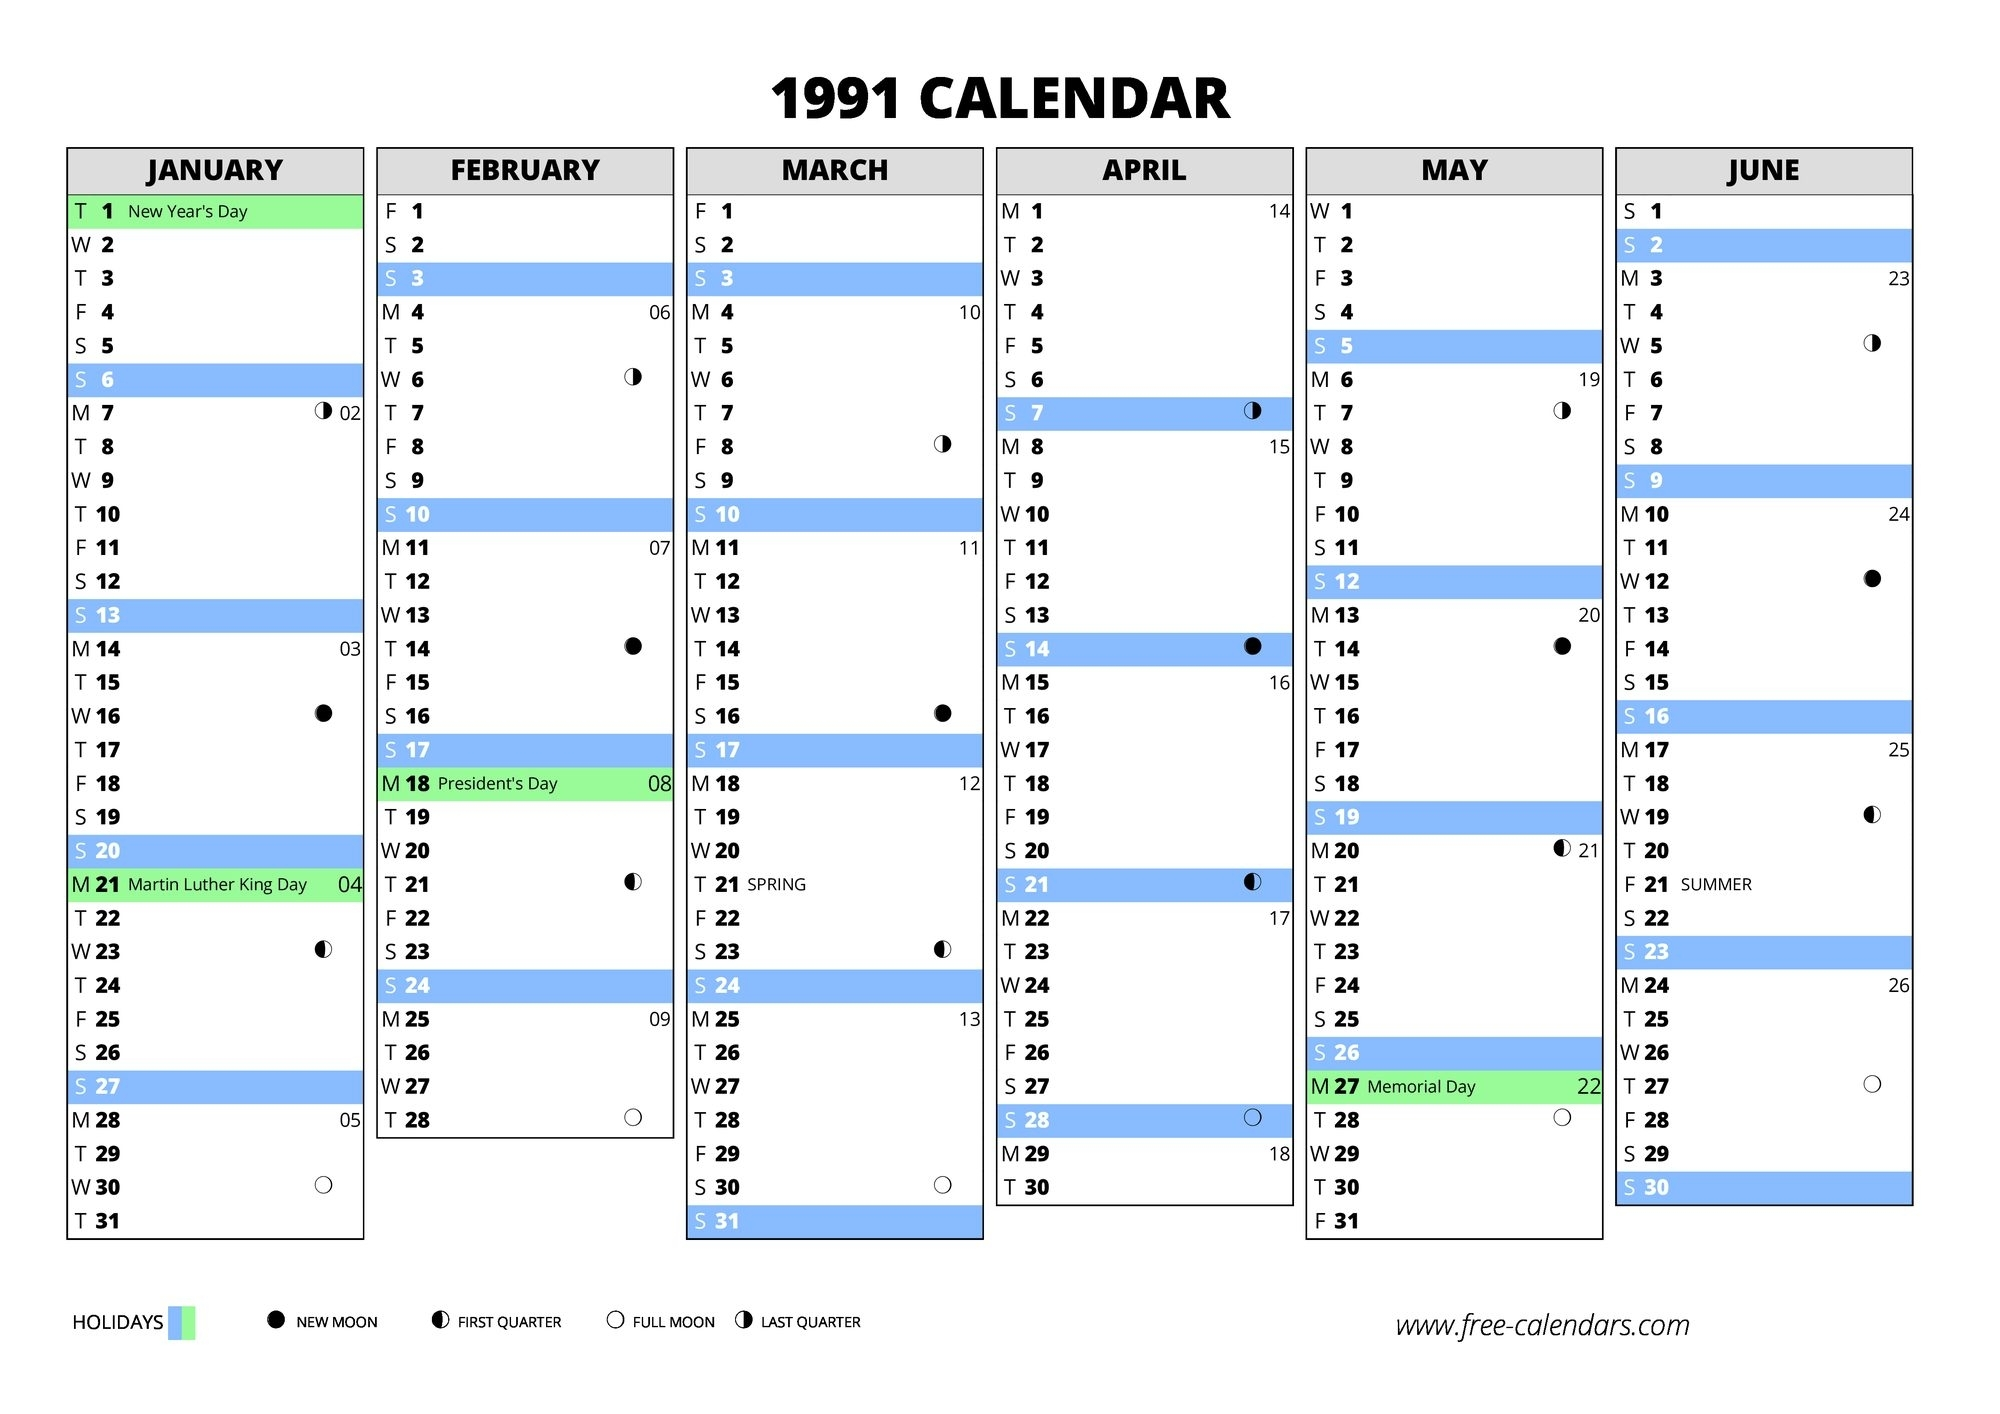 1991 Calendar ≡ Free-Calendars